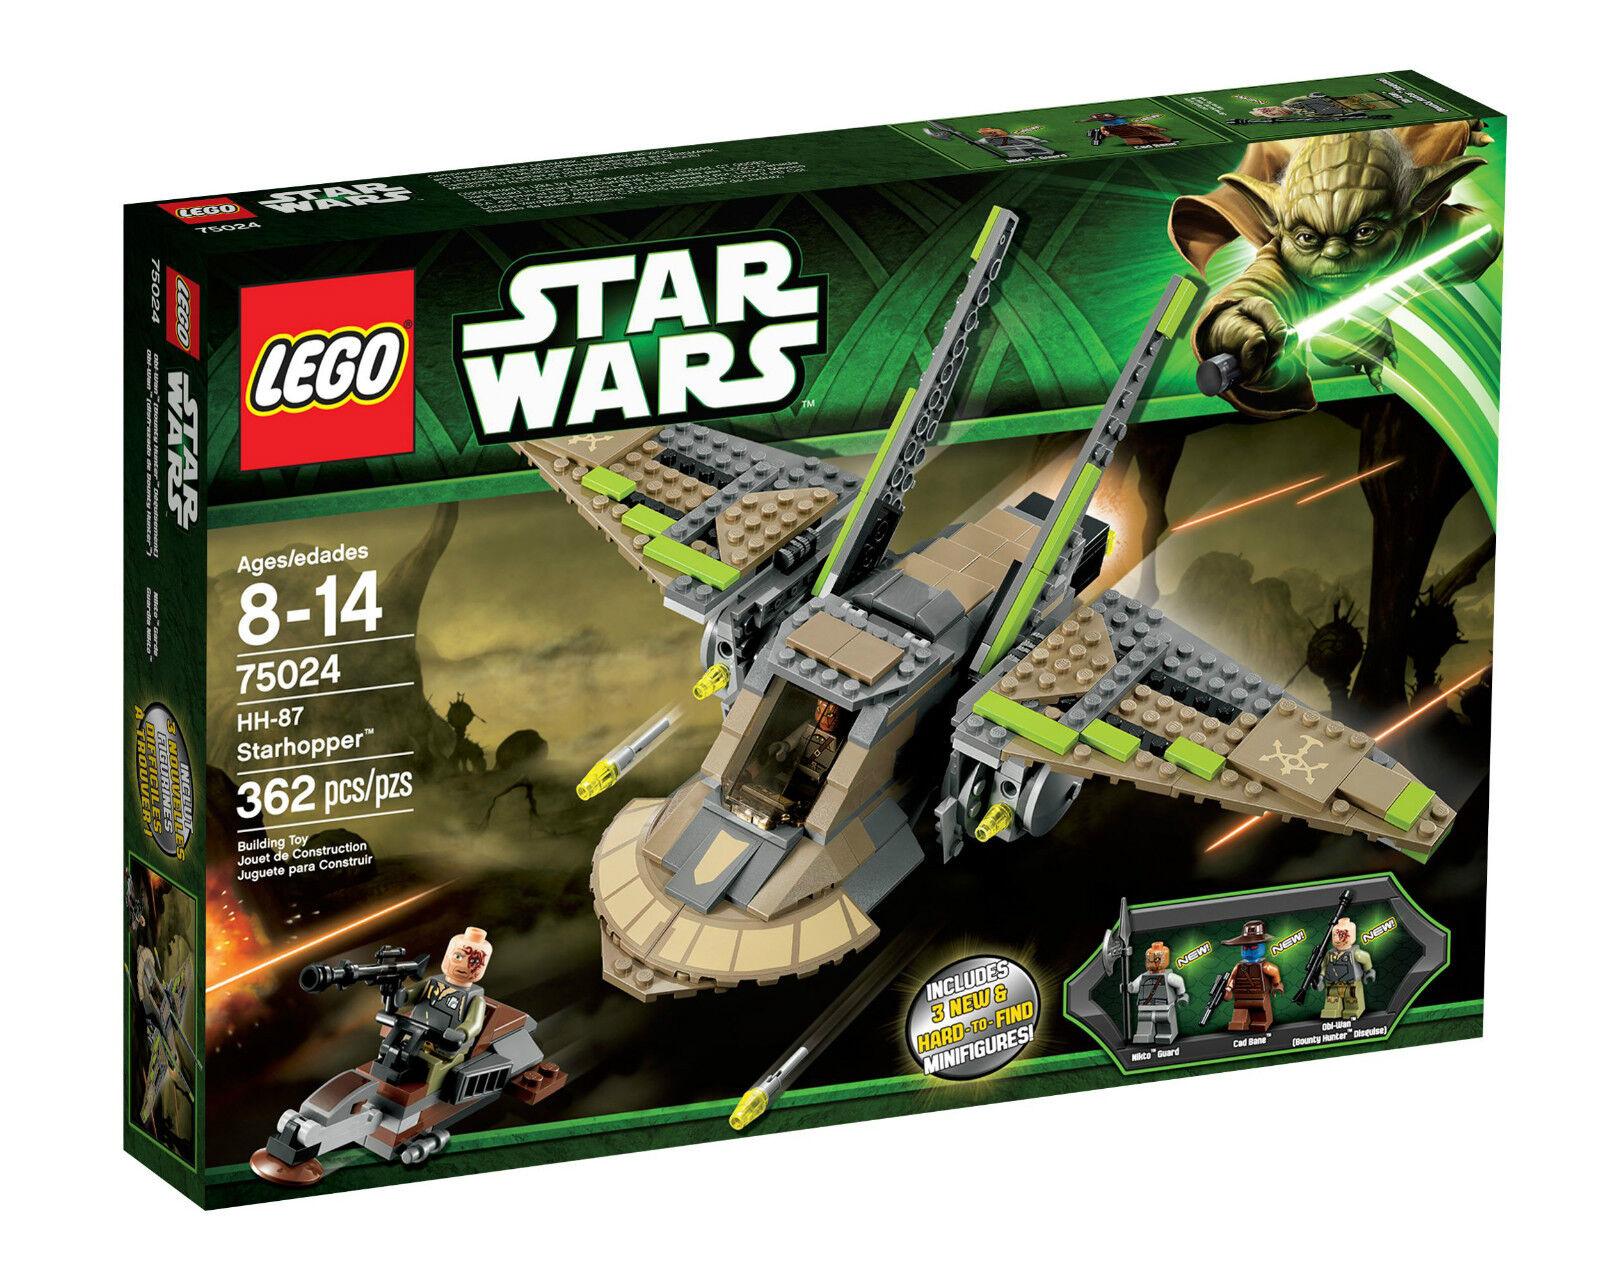 LEGO Star Wars 75024 HH 87 Starhopper Obi Wan RAKO Hardeen Cad Bane Nikto wächte